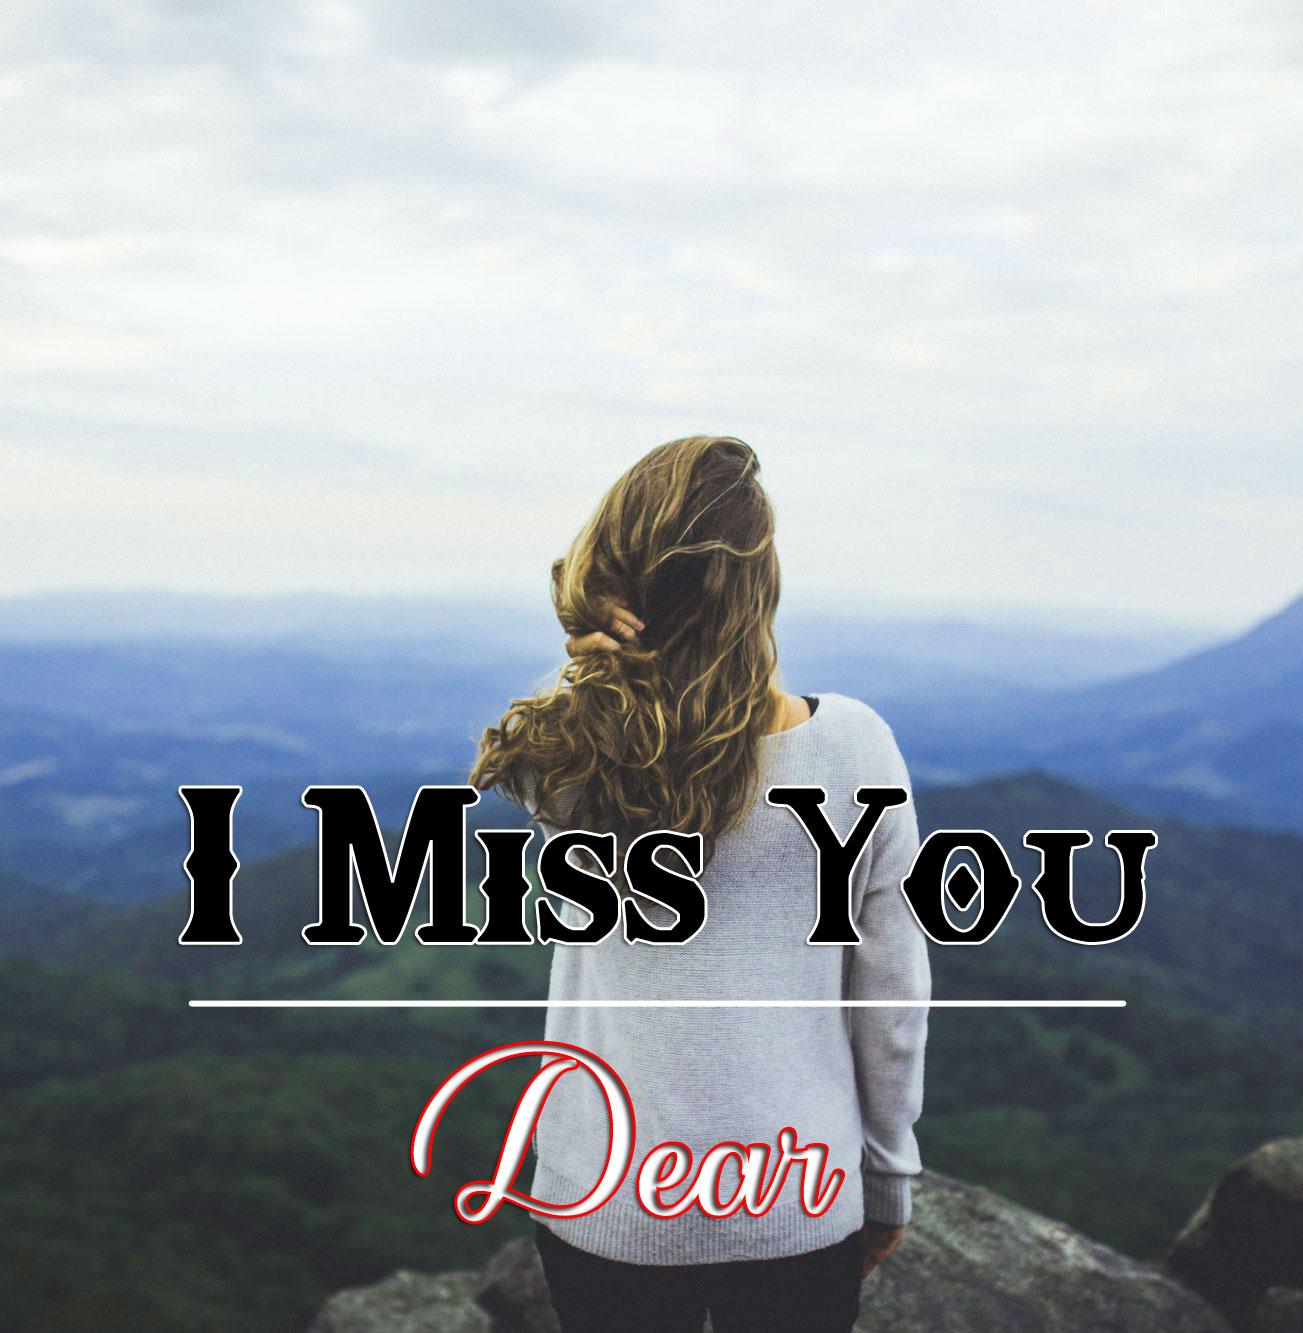 Dear HD I miss you Images 2